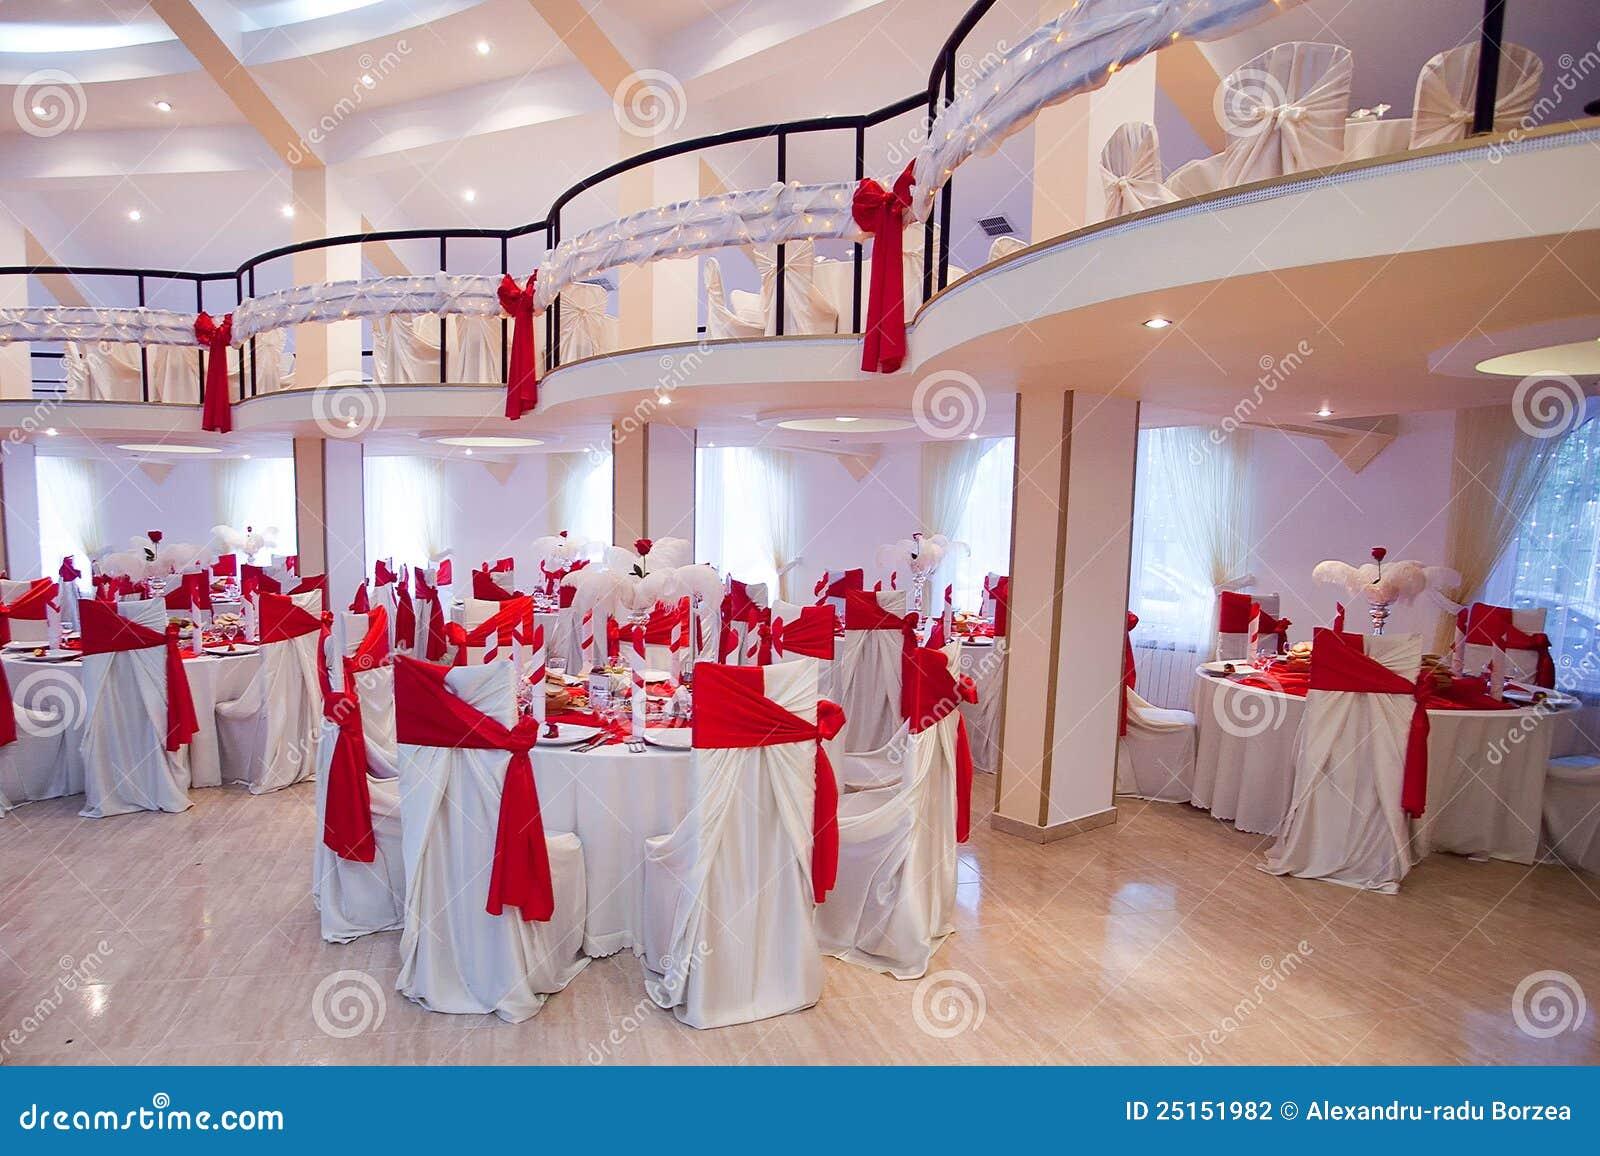 Wedding ceremony saloon stock photography image 25151982 - Deco de salle mariage ...